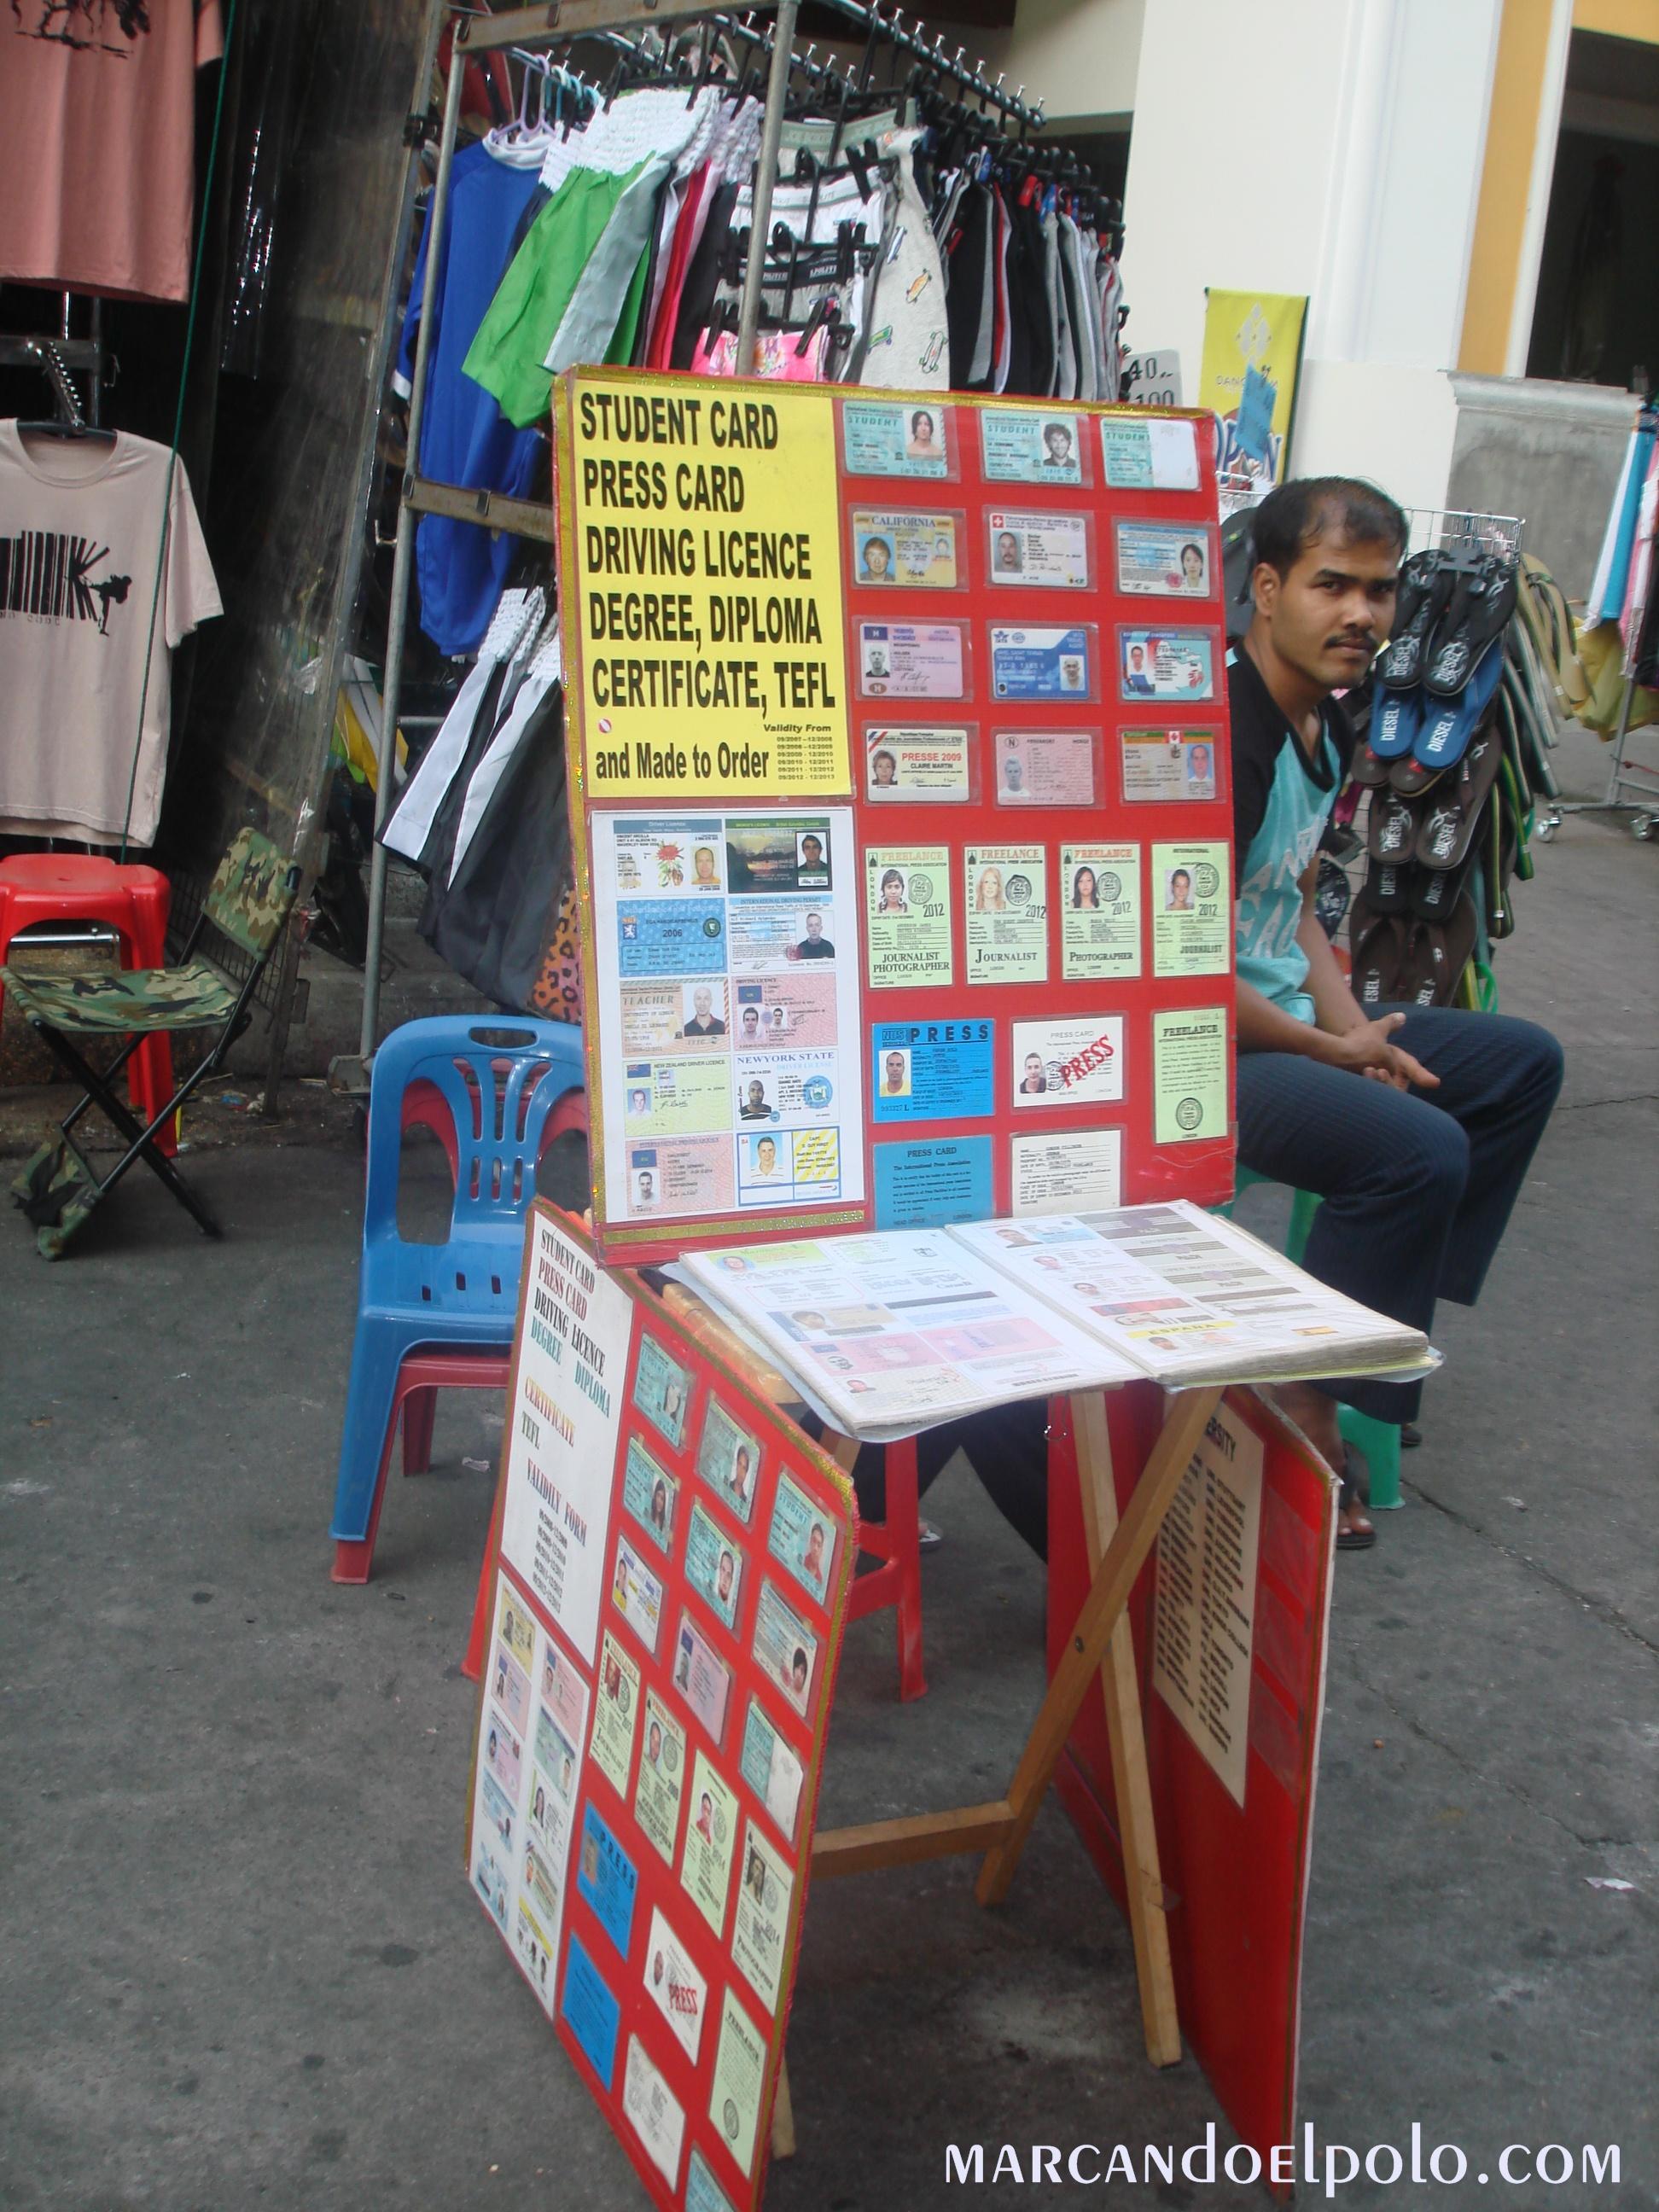 Viajar barato por Asia: ISIC